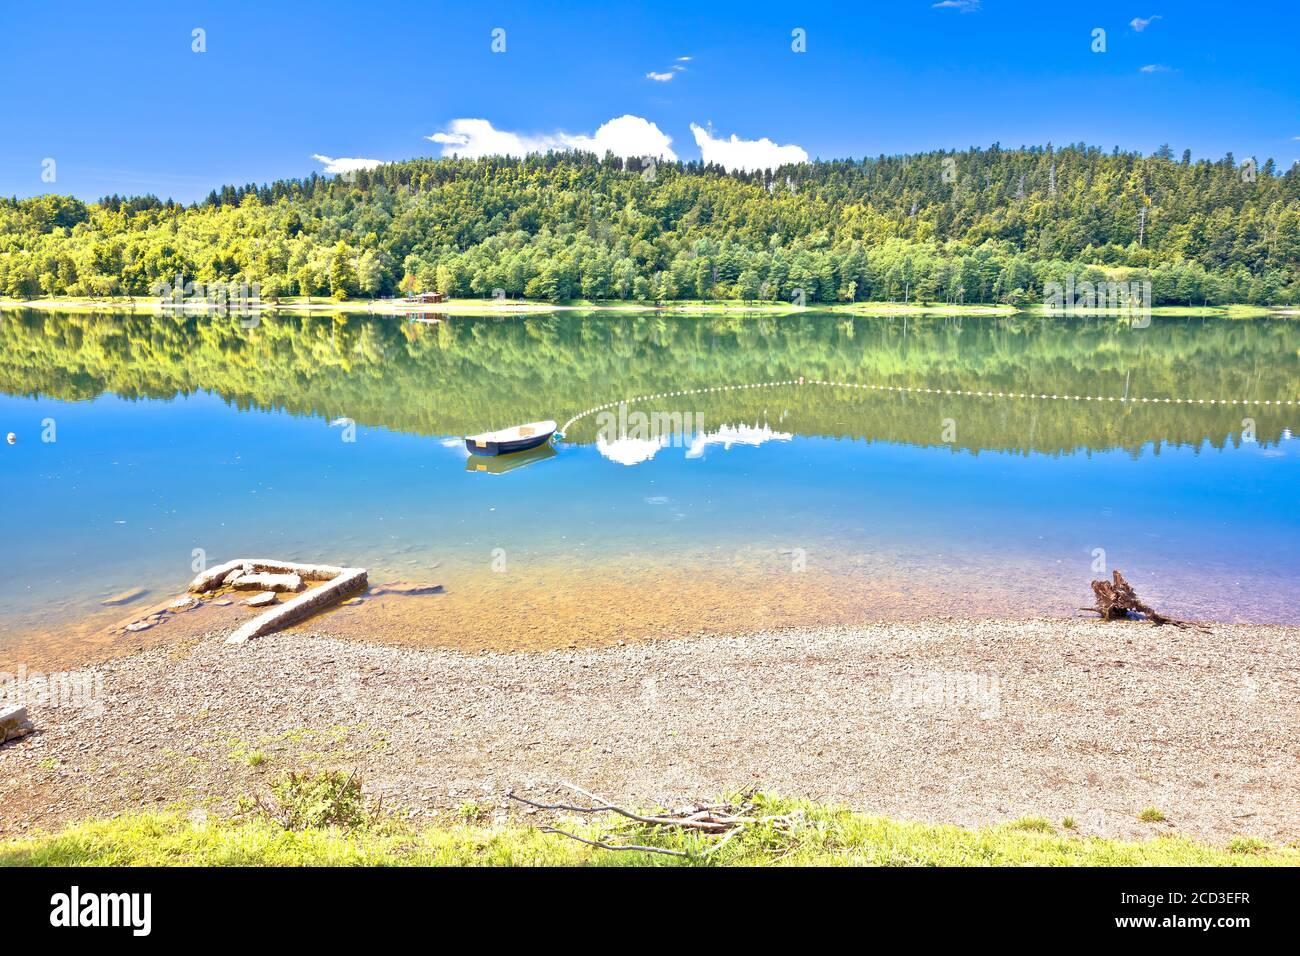 Bajer lake beach in Fuzine view, Gorski kotar region of Croatia Stock Photo